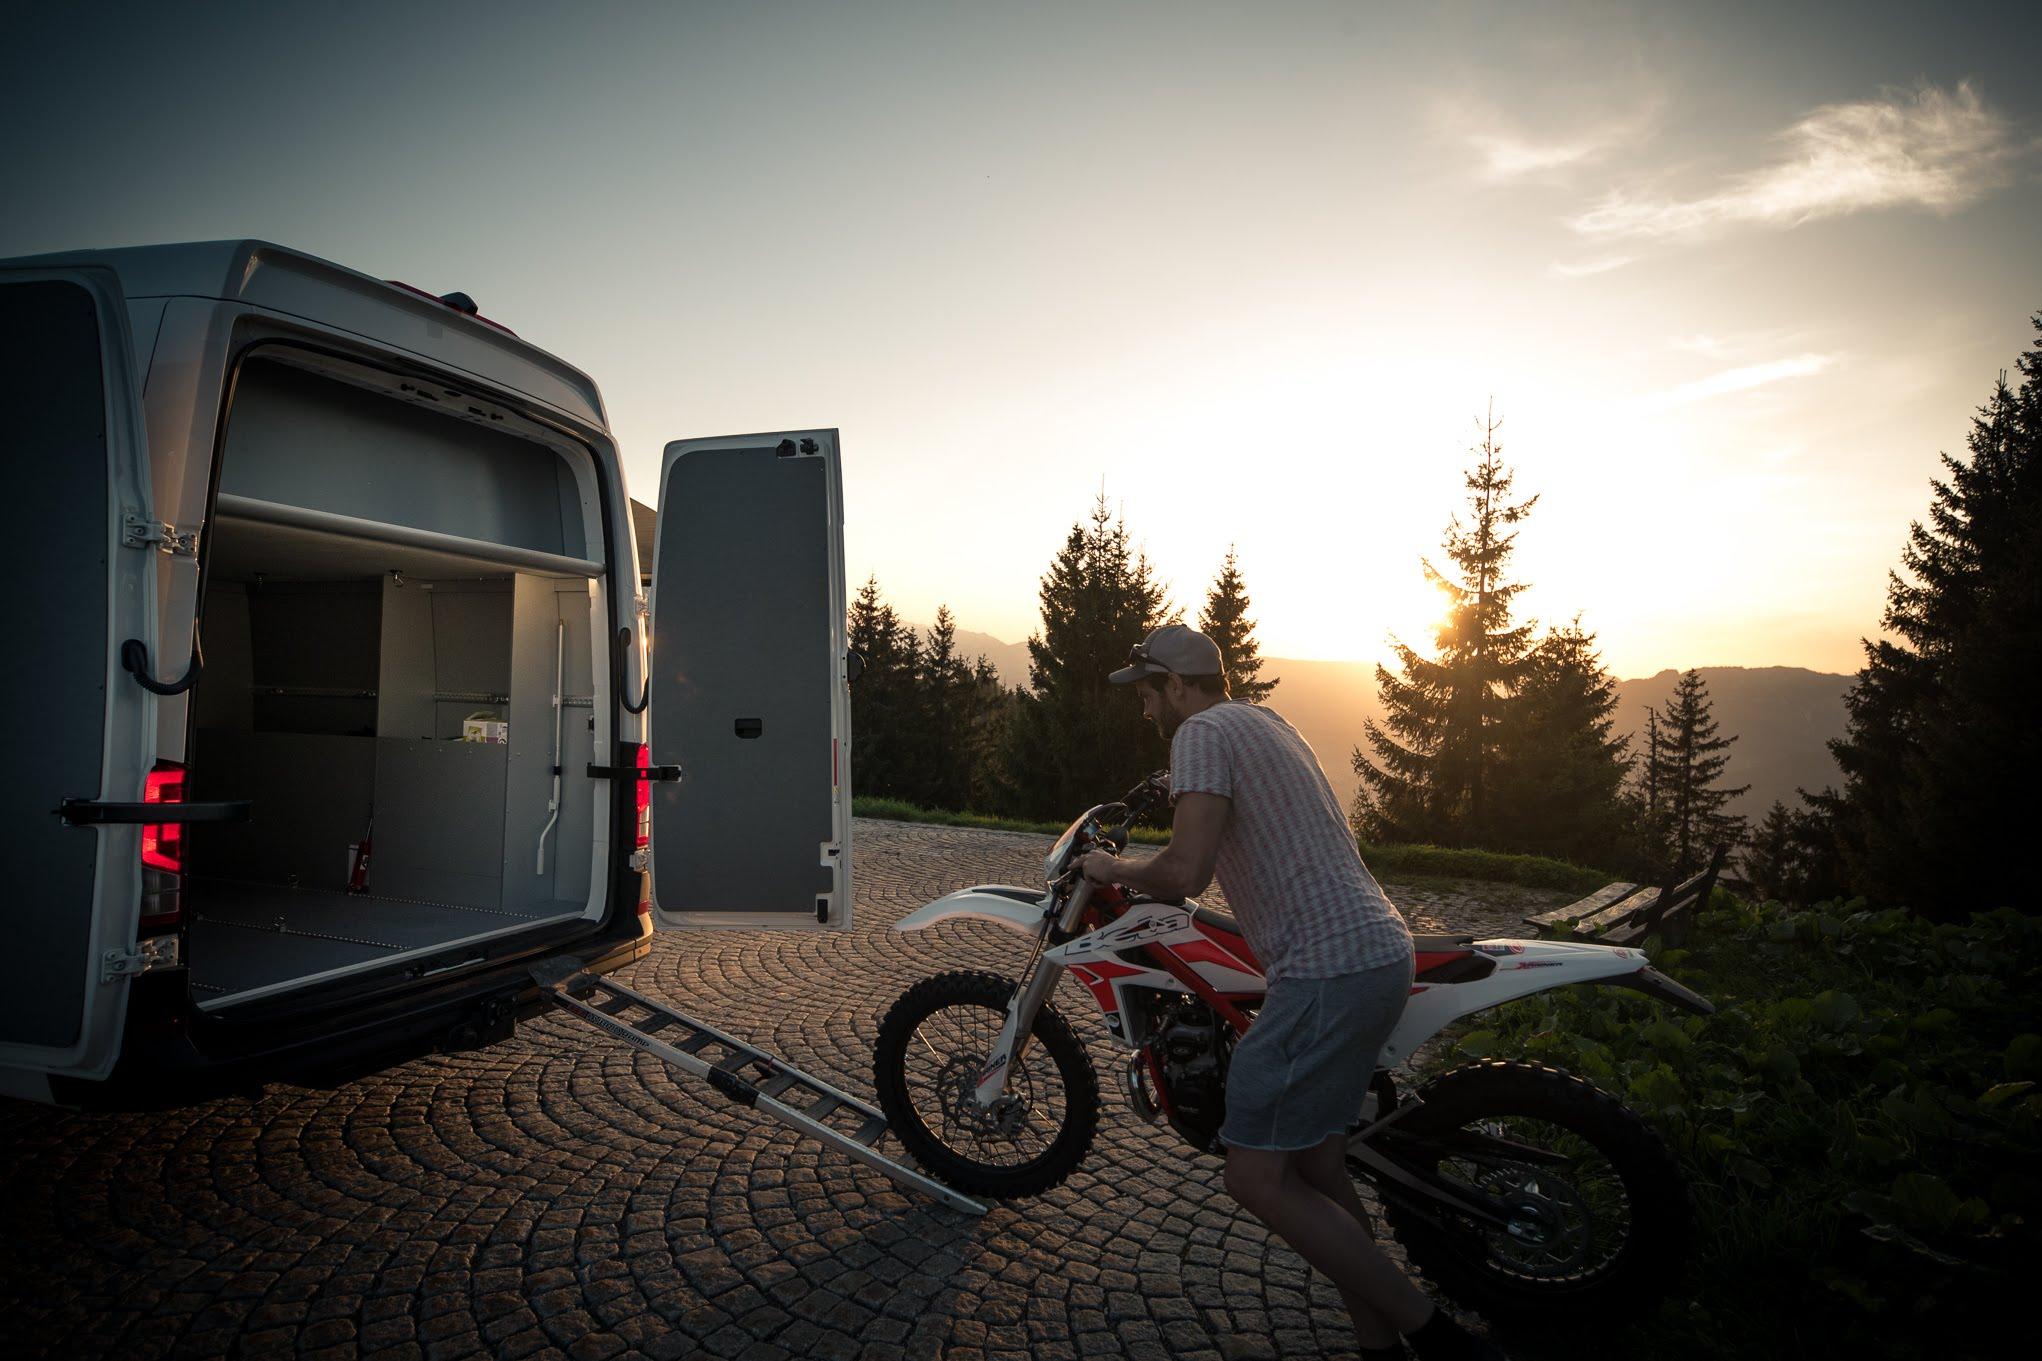 vr-motorhomes groesste garage 3 motorraeder roller scooter bmw ktm gs adventure